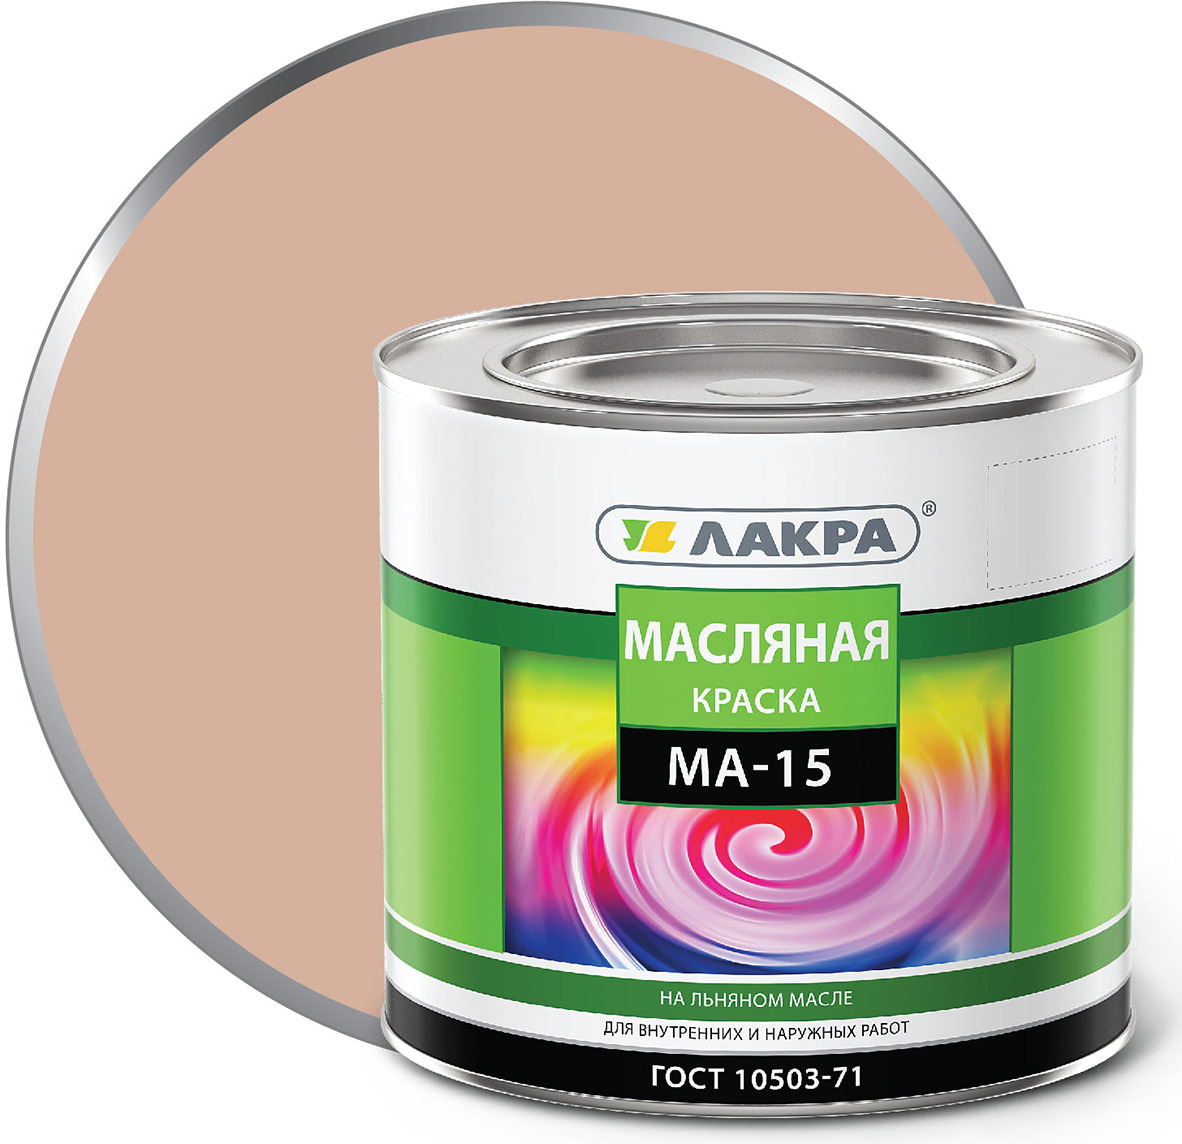 Краска Лакра МА-15, бежевый, 1,9 кг краска масляная лакра ма 15 бежевый 0 9кг